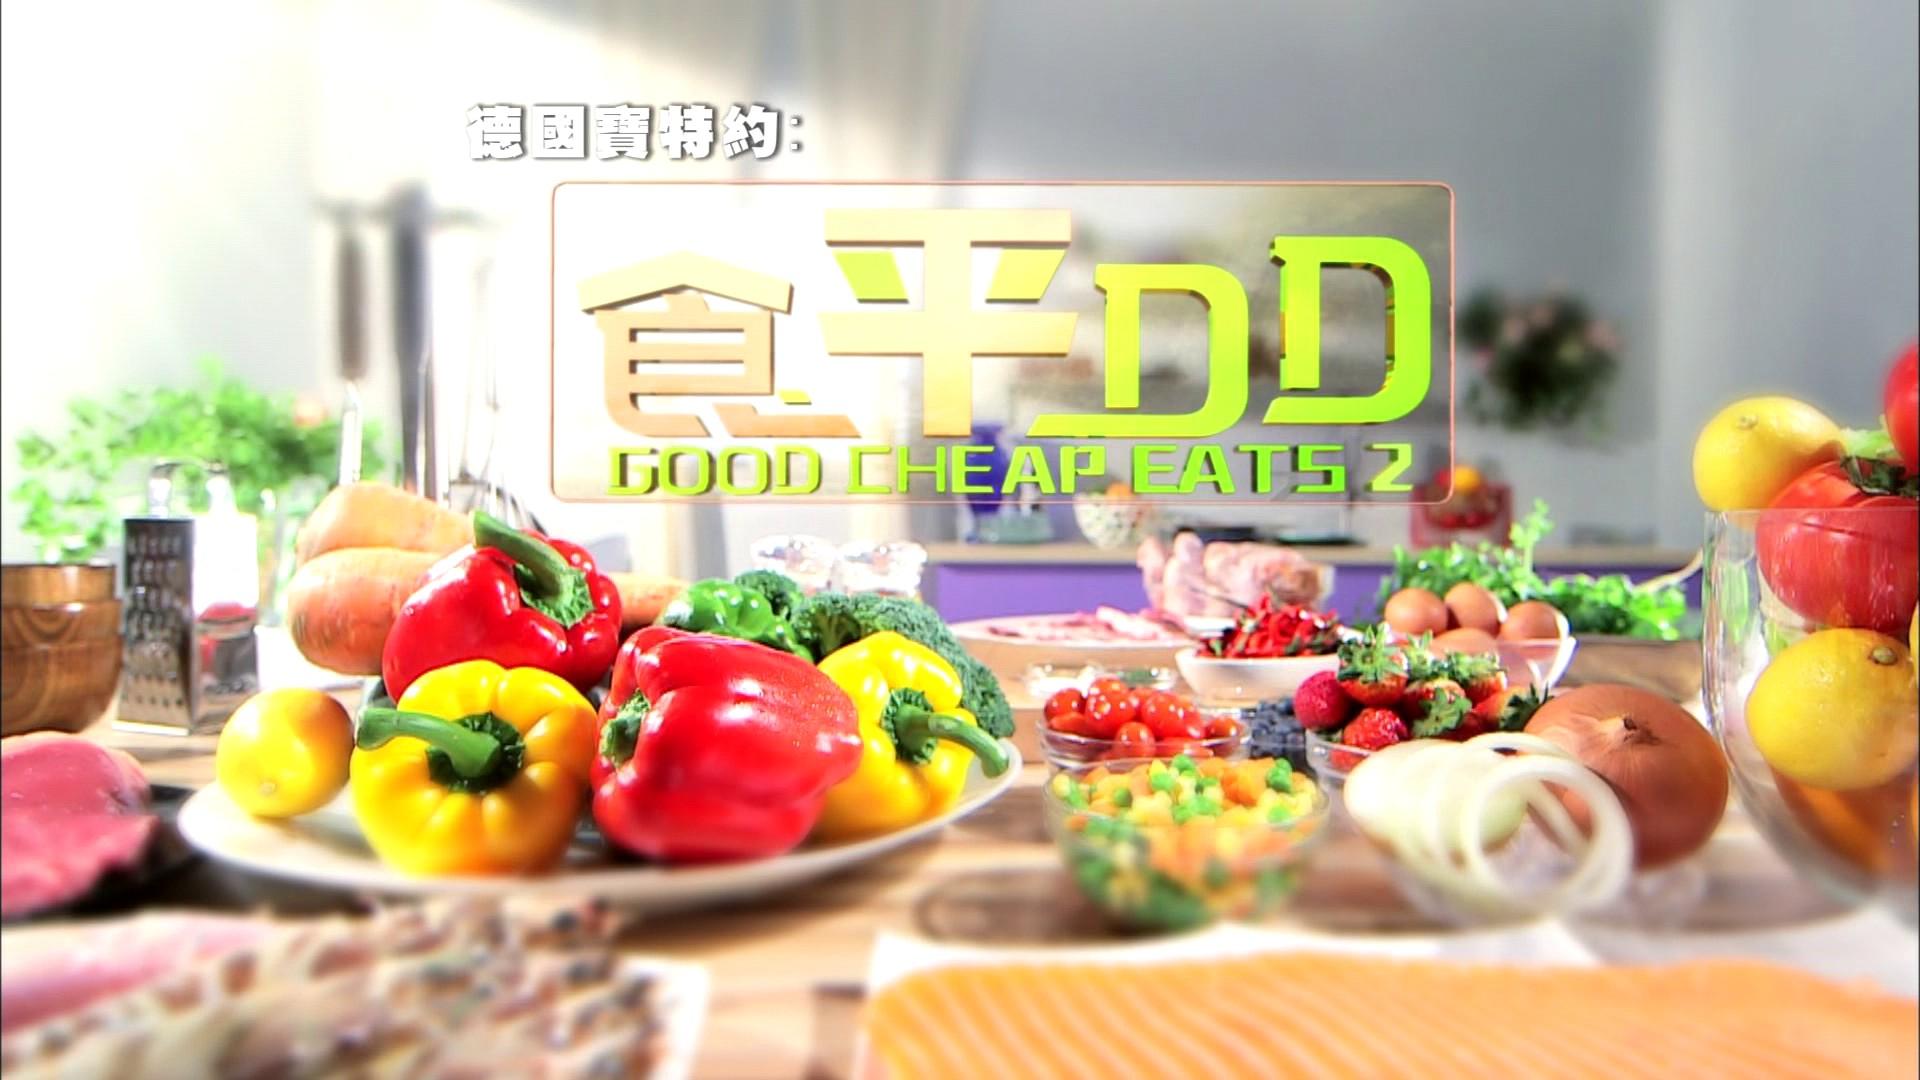 Good Cheap Eats 2 – 食平DD